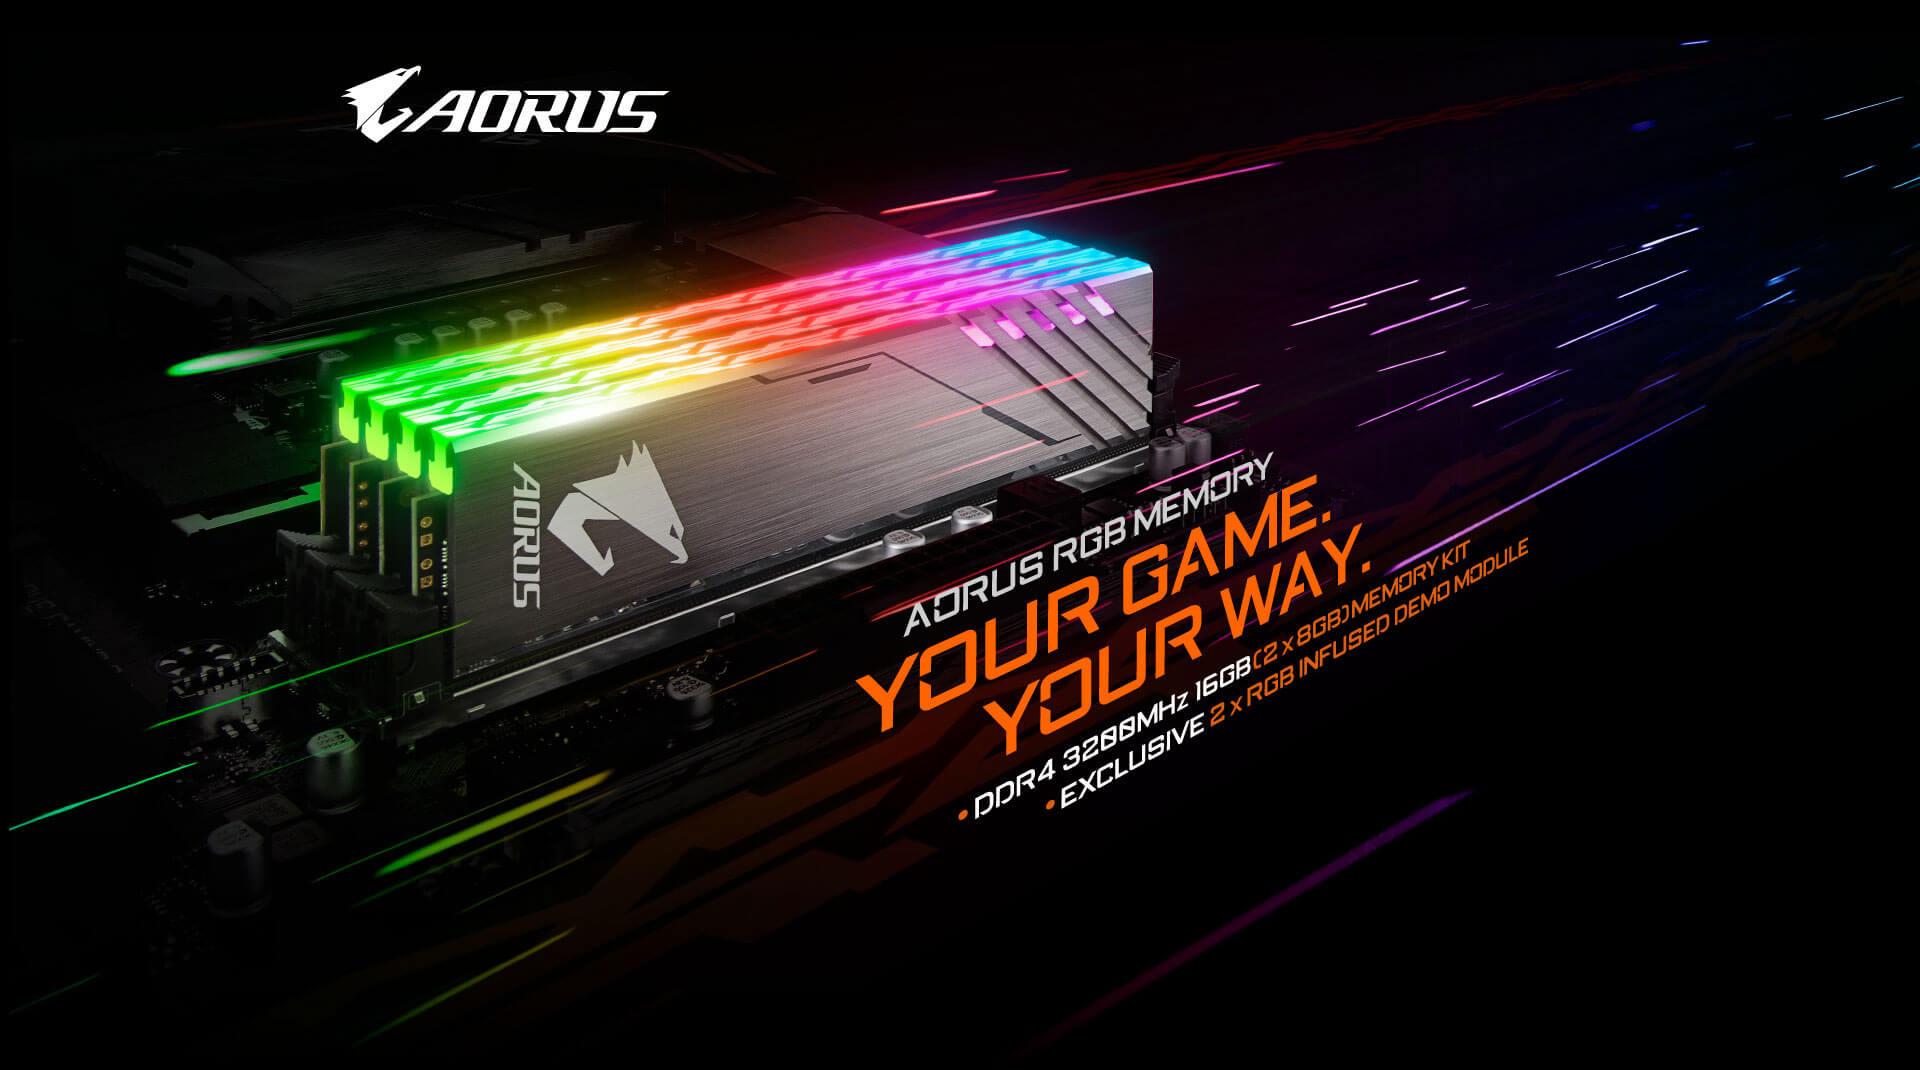 AORUS RGB Memory 16GB (2x8GB) 3200MHz (With Demo Kit